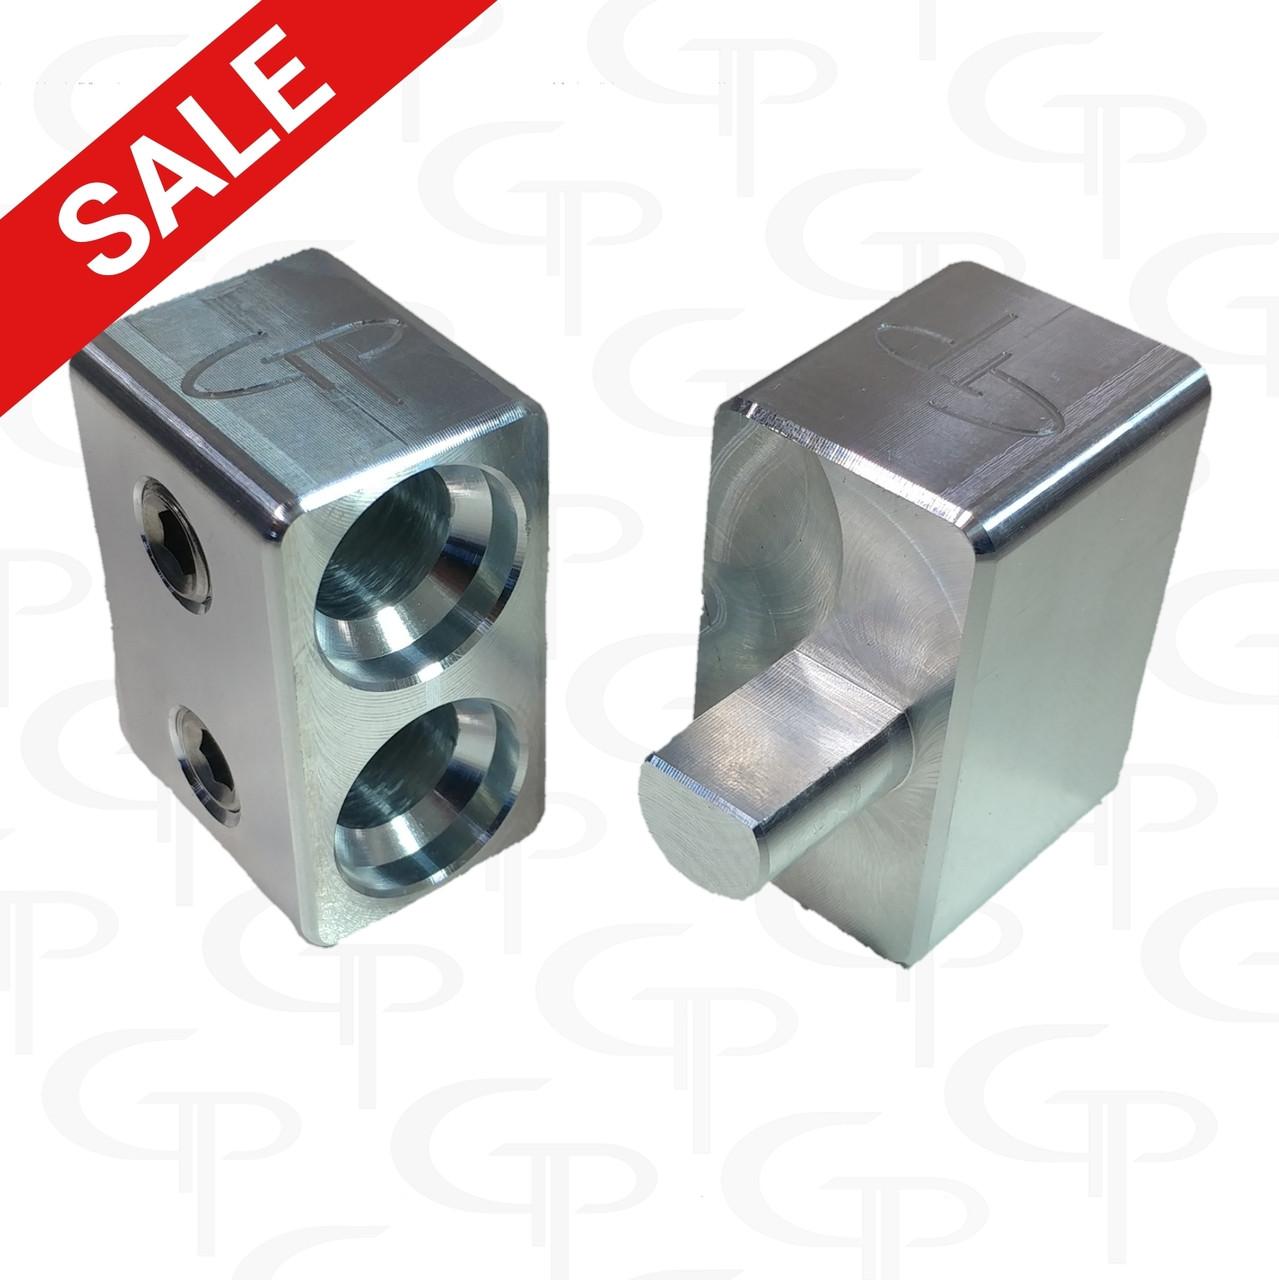 Gp Dual Amplifier Inputs Car Audio Wiring Kit